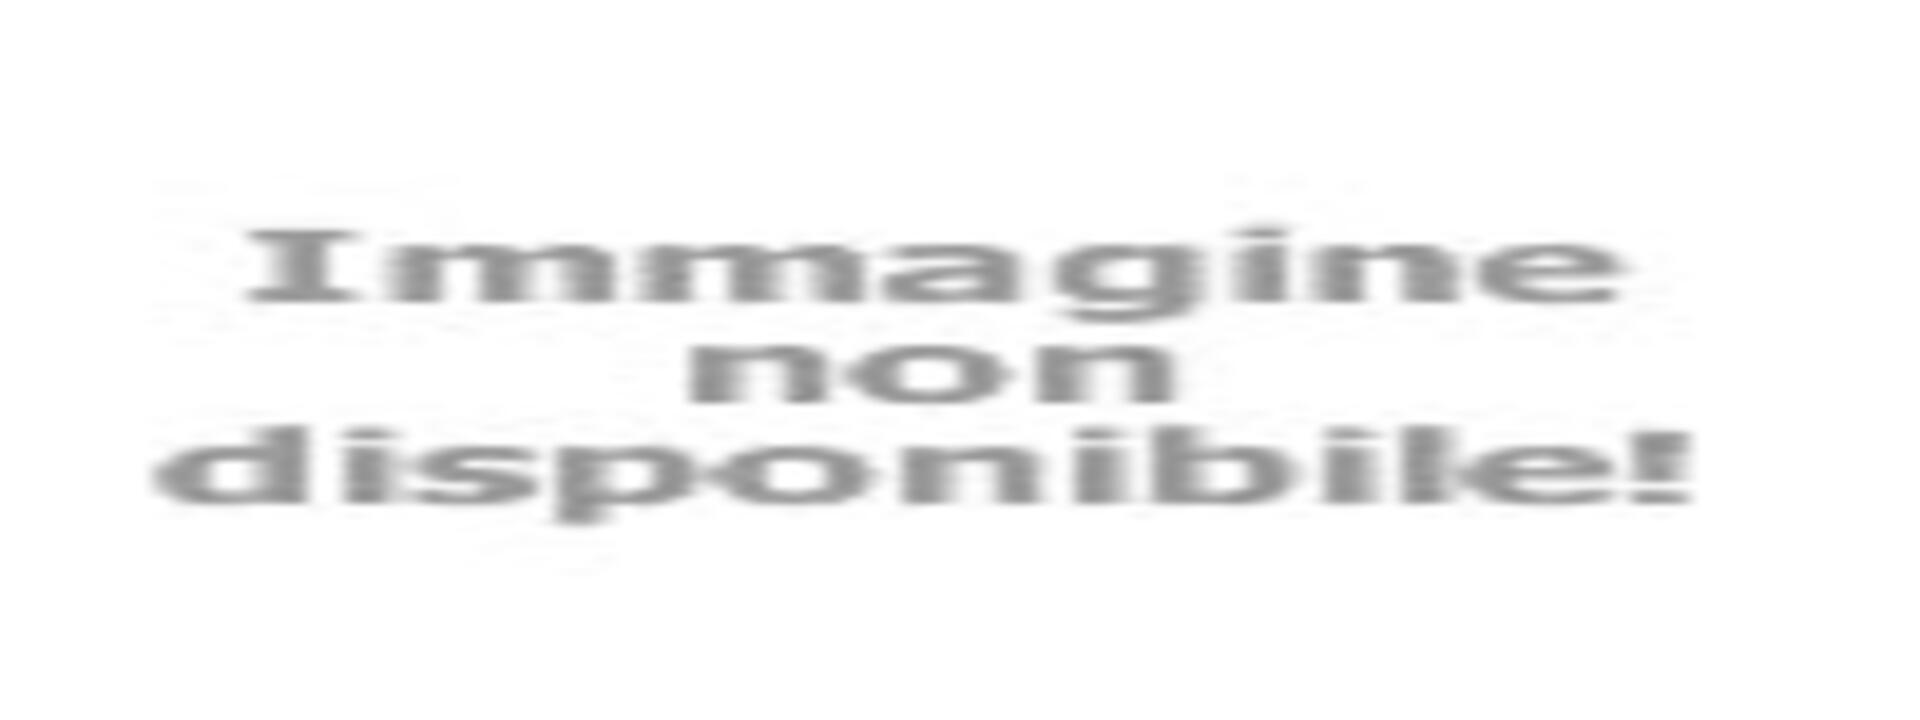 riccionepiadina it piadina-kamut-bio 001